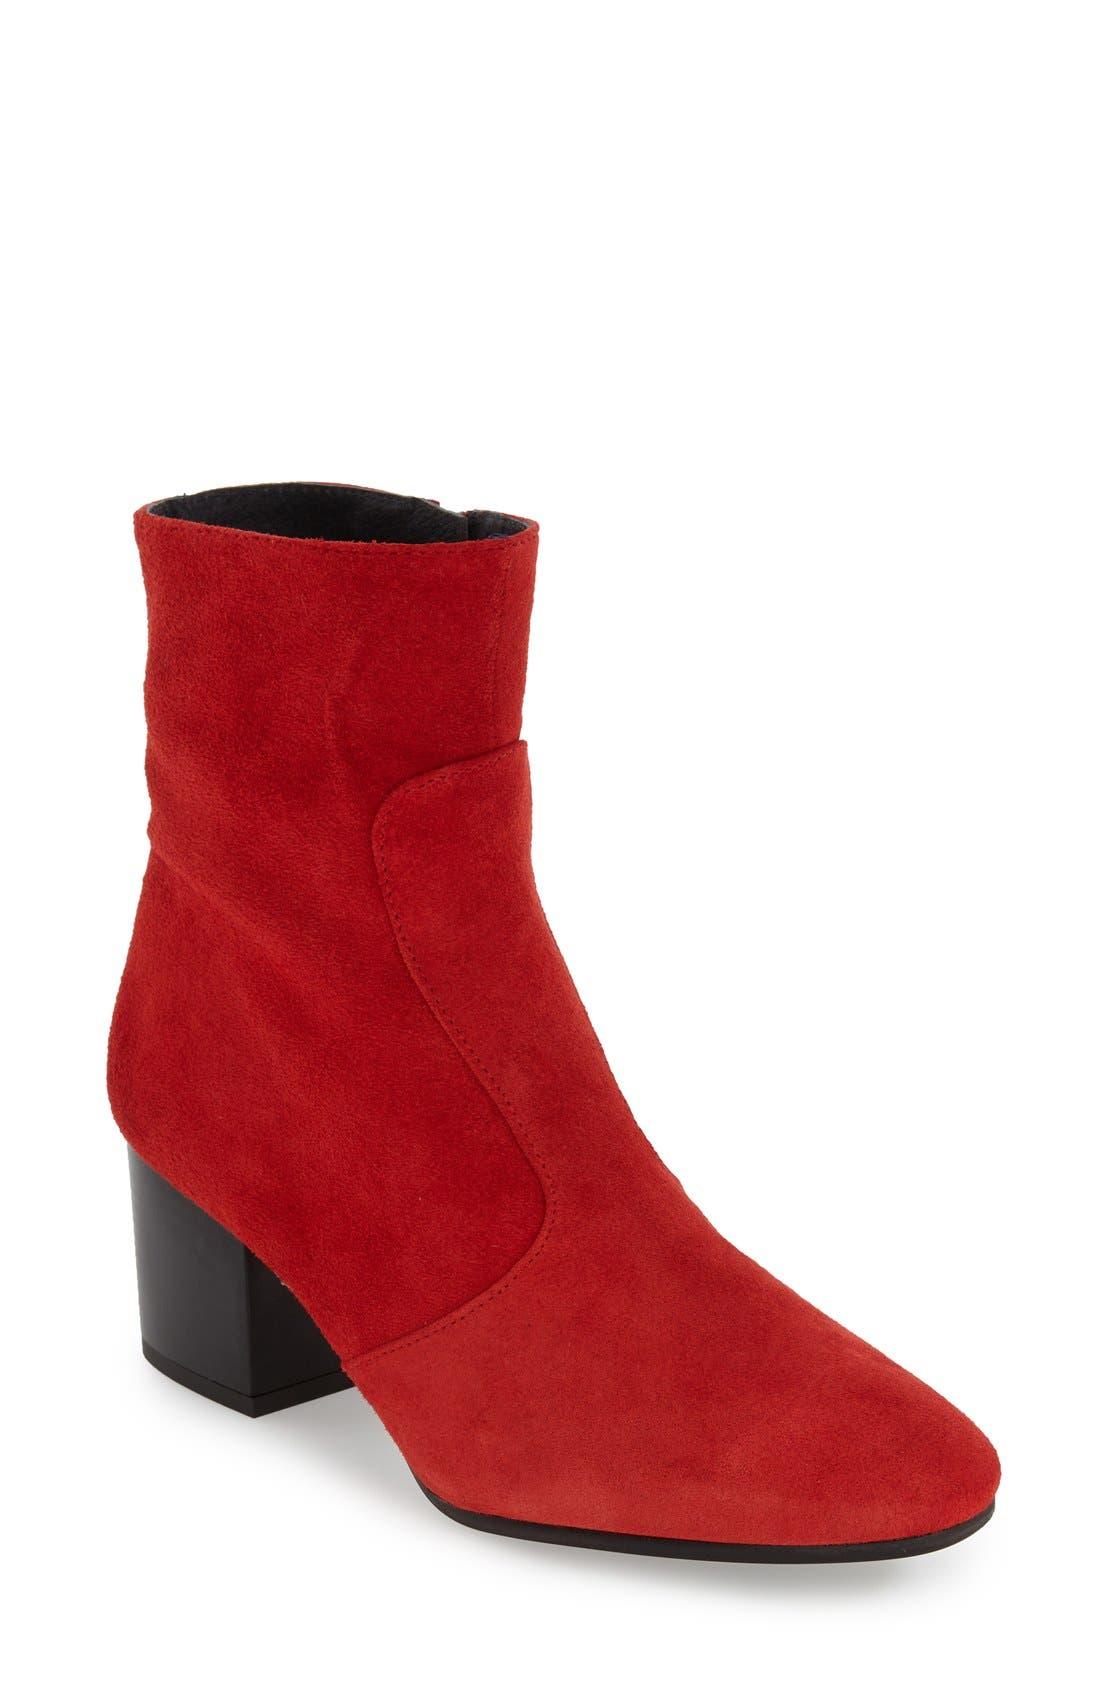 Main Image - Topshop 'Mustard' Western Boot (Women)